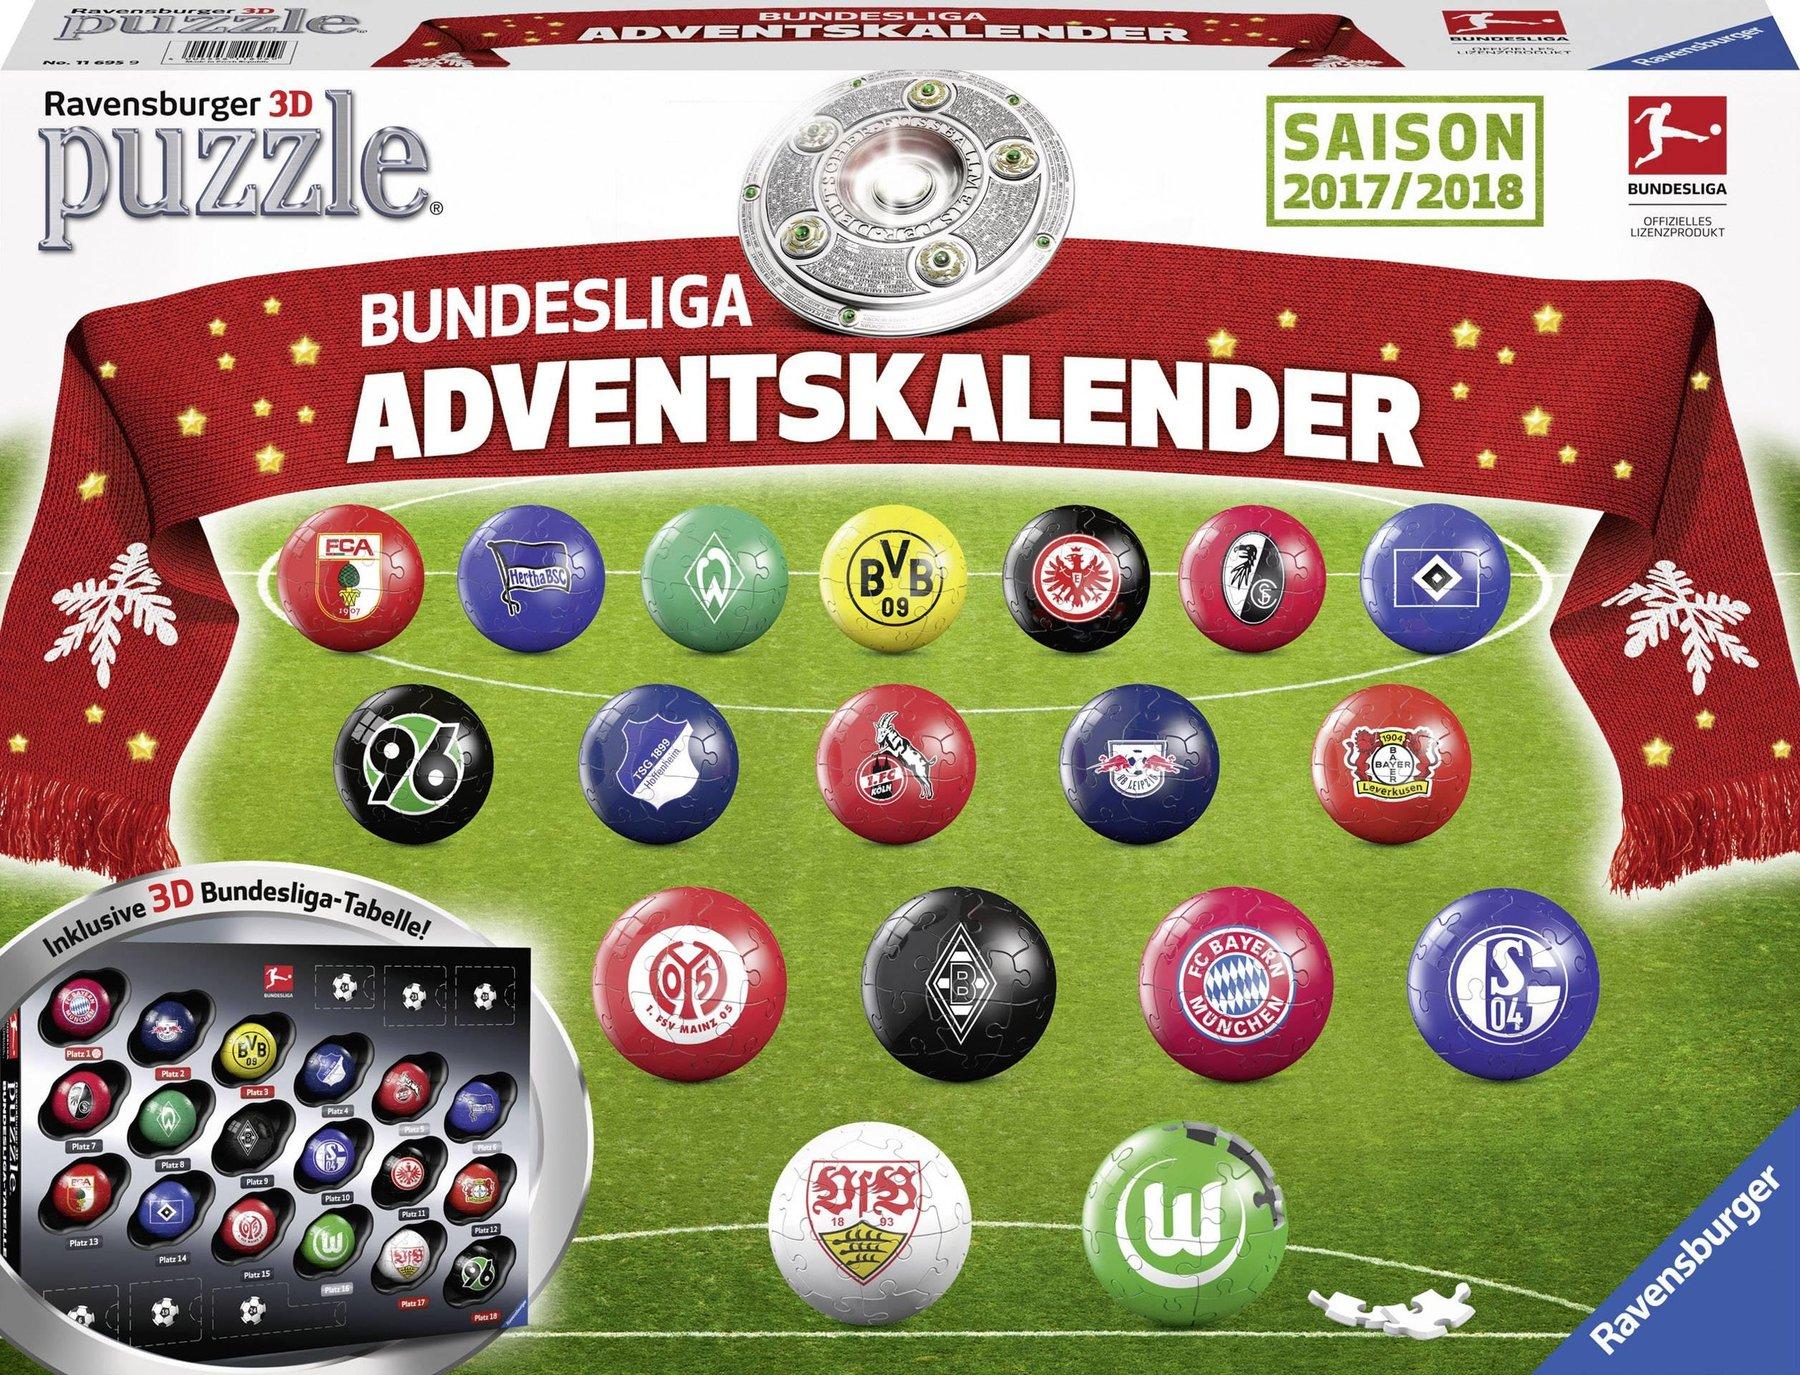 Bundesliga Adventskalender